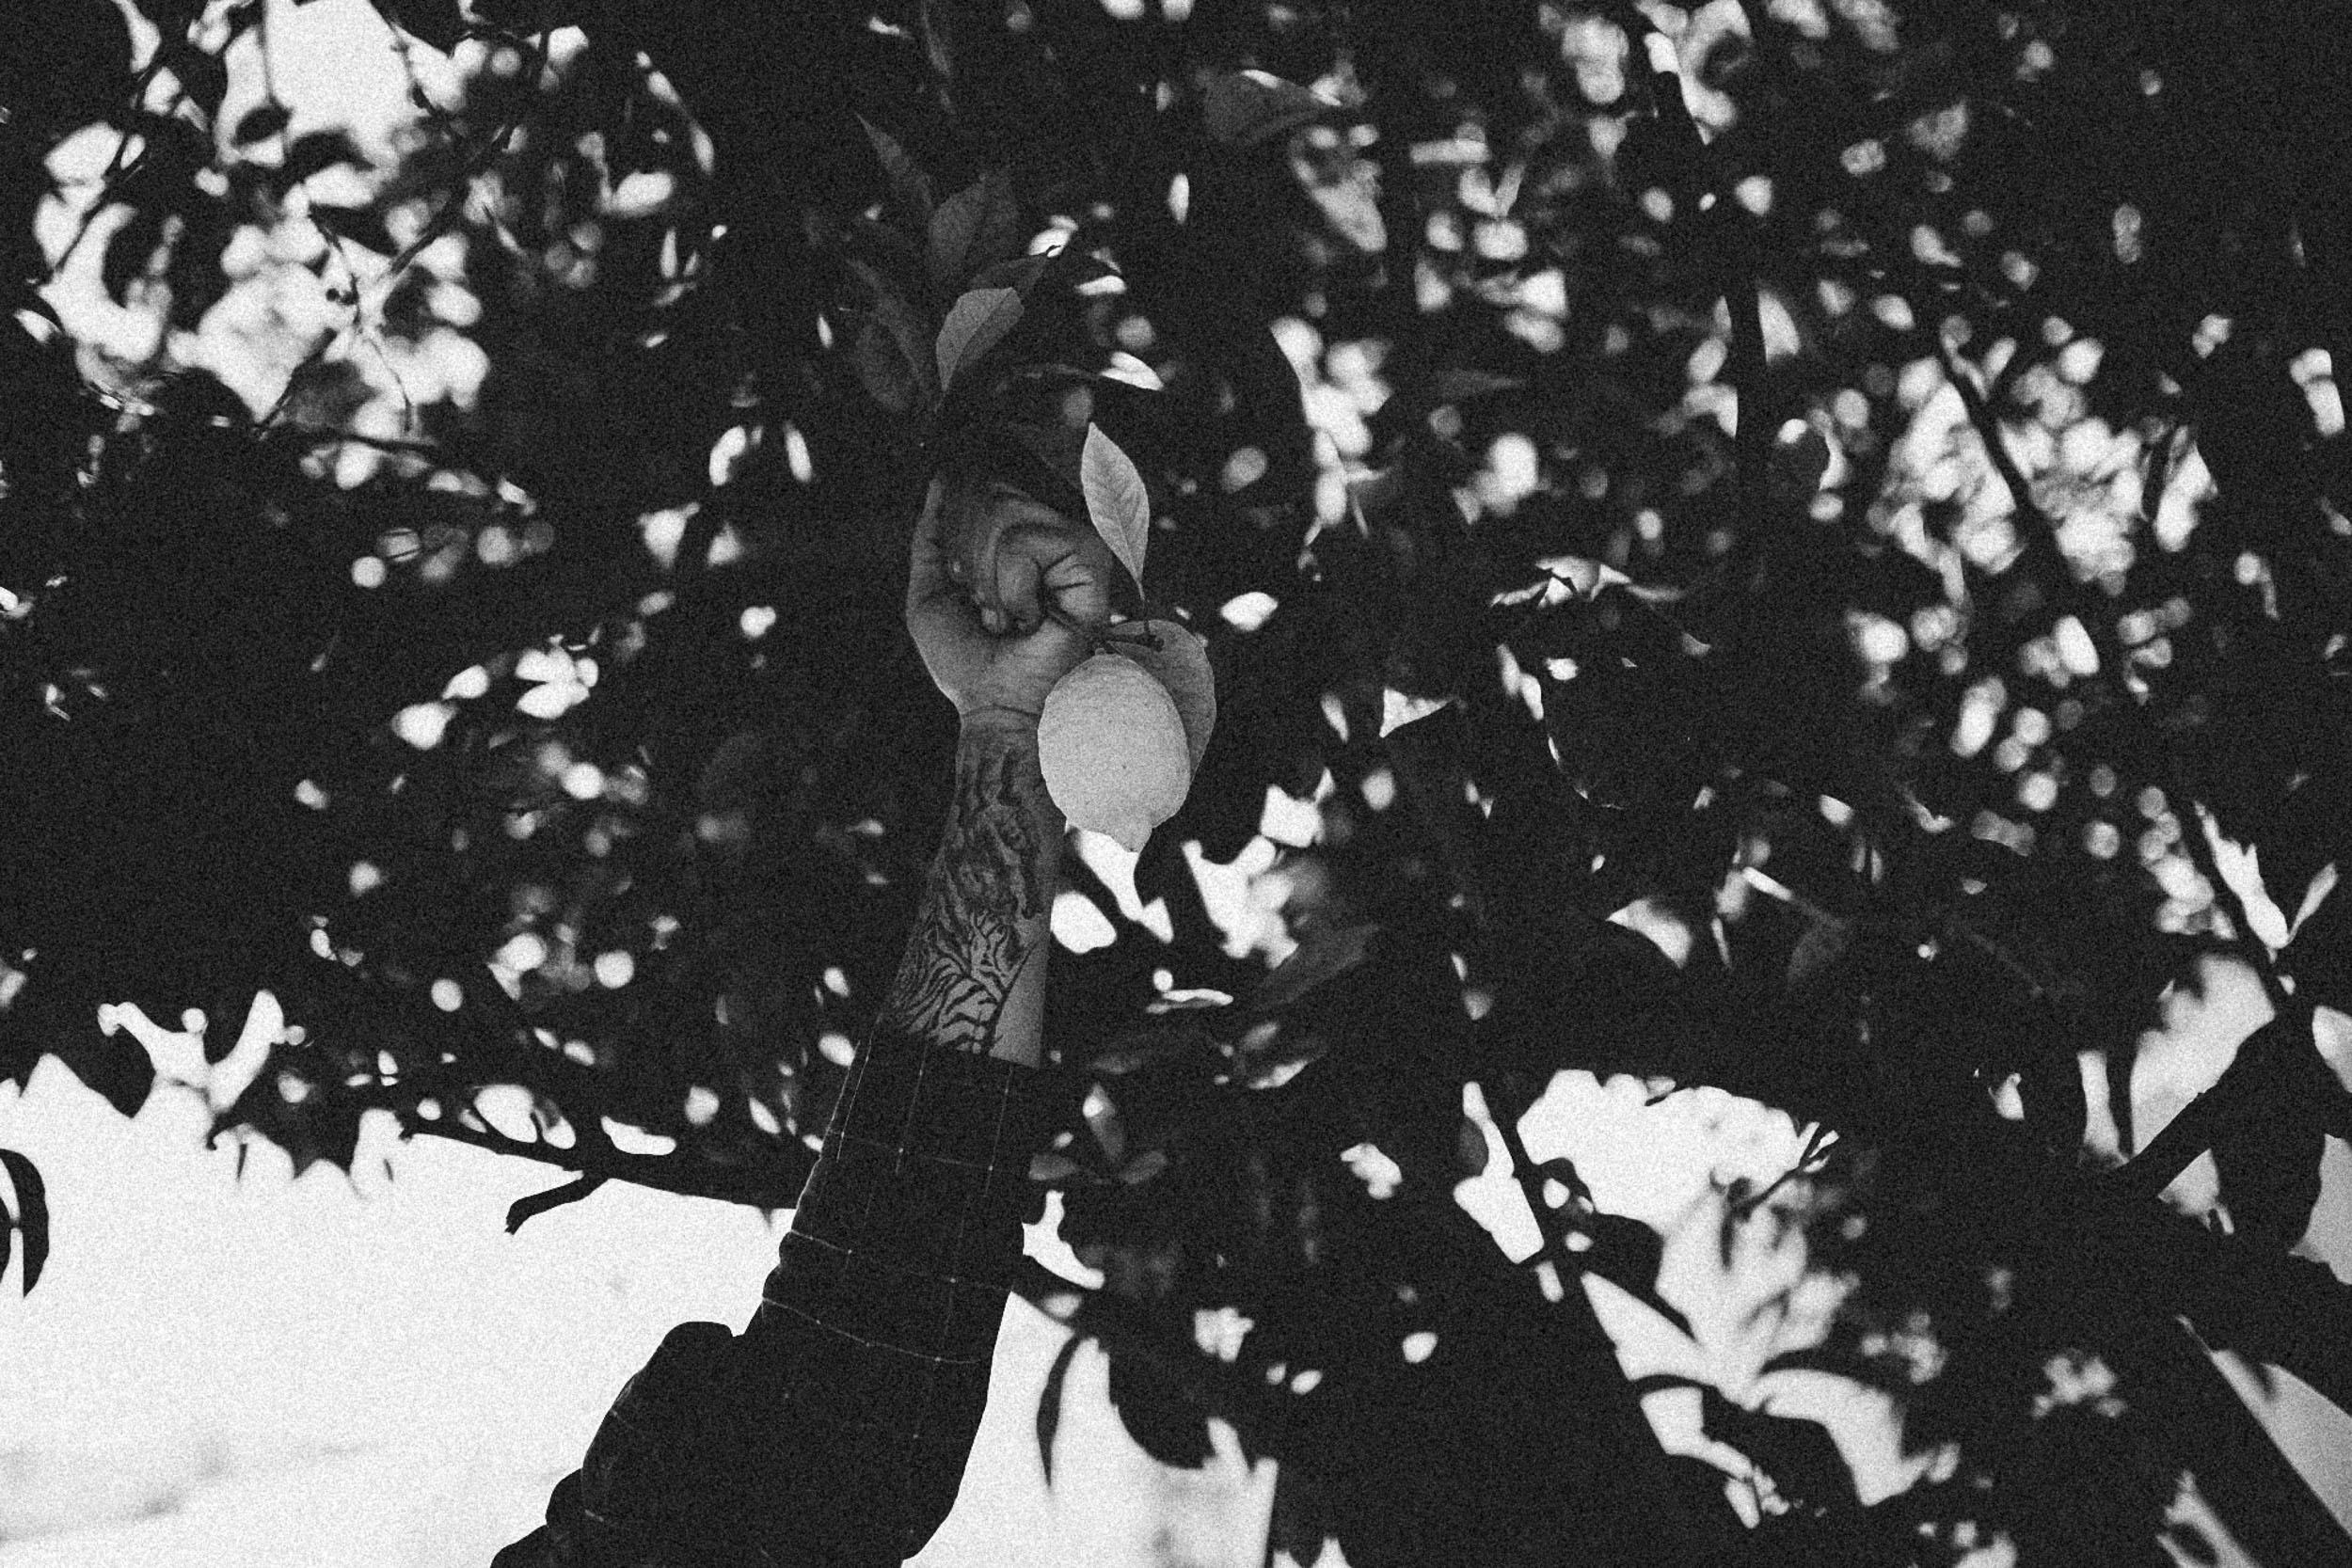 film-archive-kc.locke-14.jpg